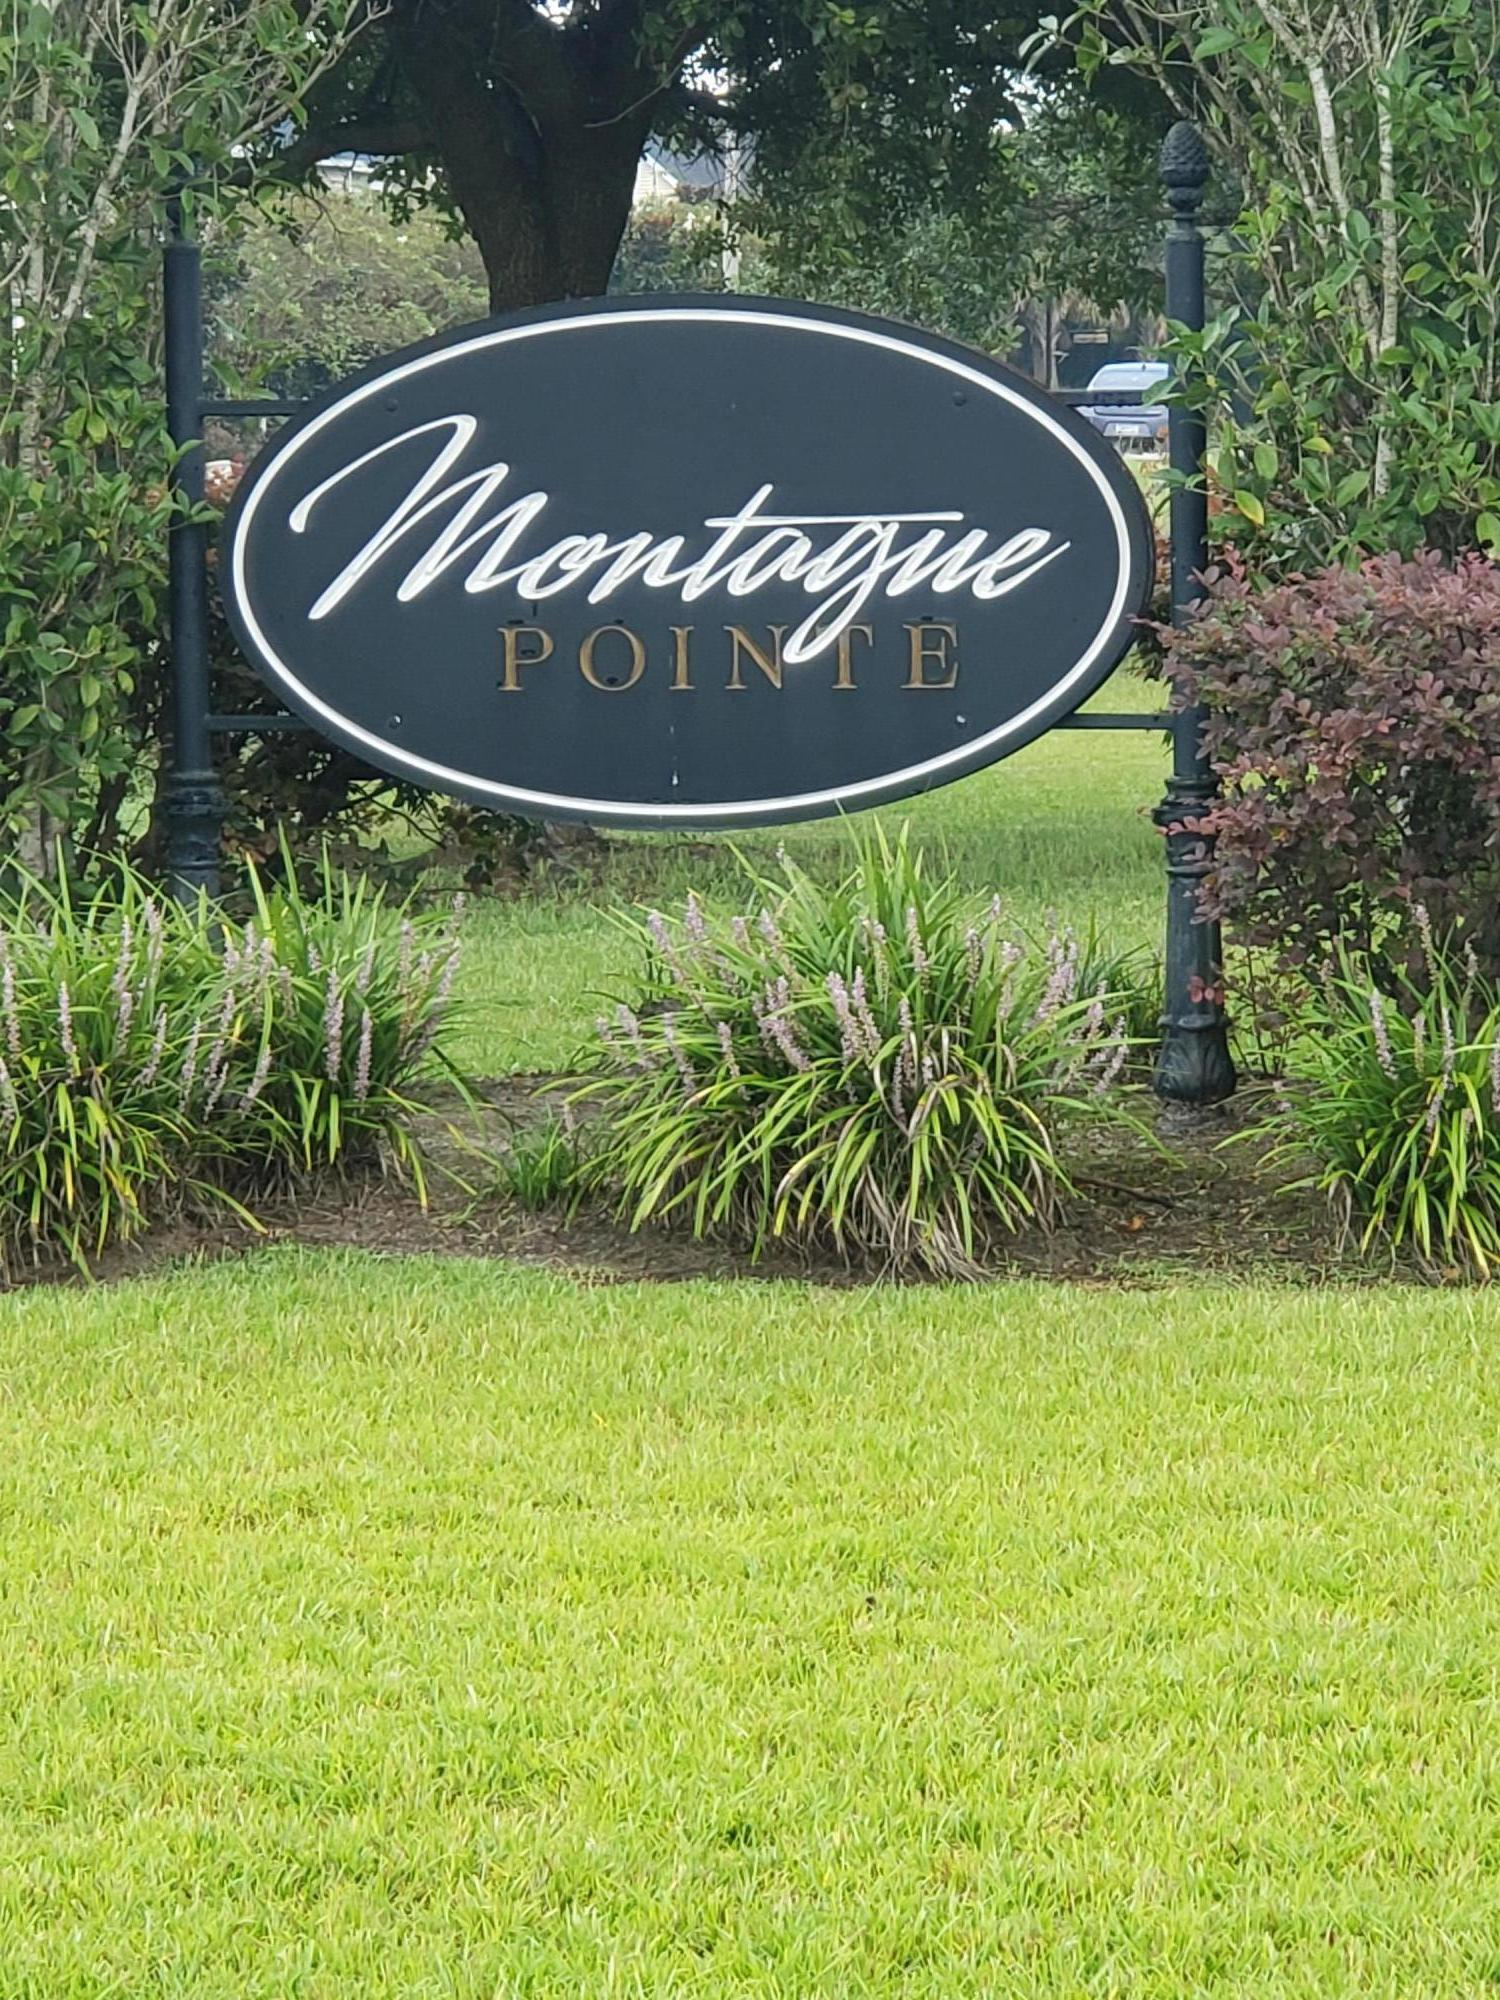 Montague Pointe Homes For Sale - 100 Gavins, Goose Creek, SC - 23